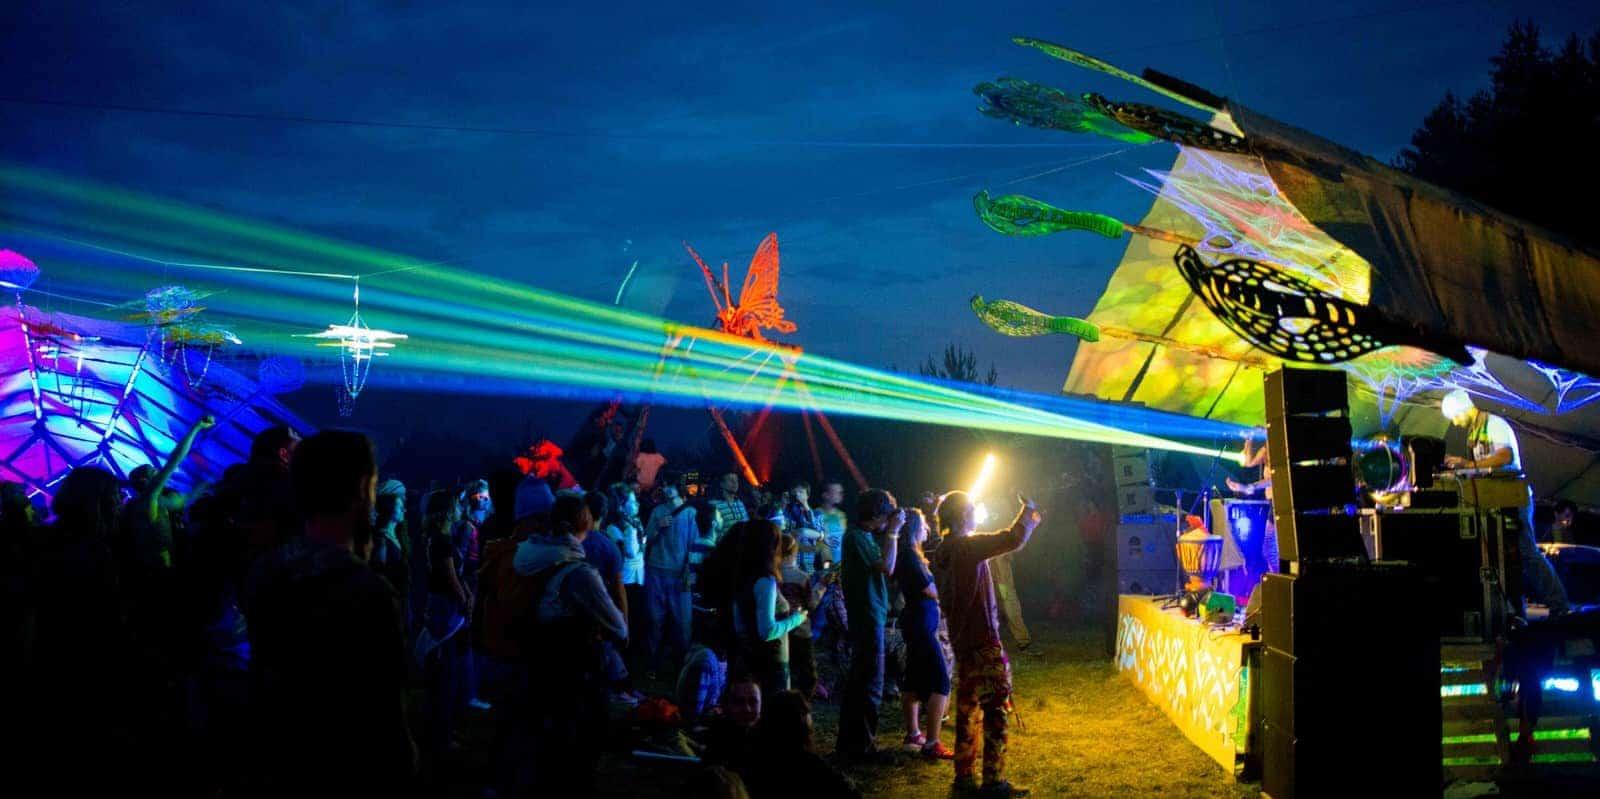 Фестиваль арт-кемпинг «Поток»